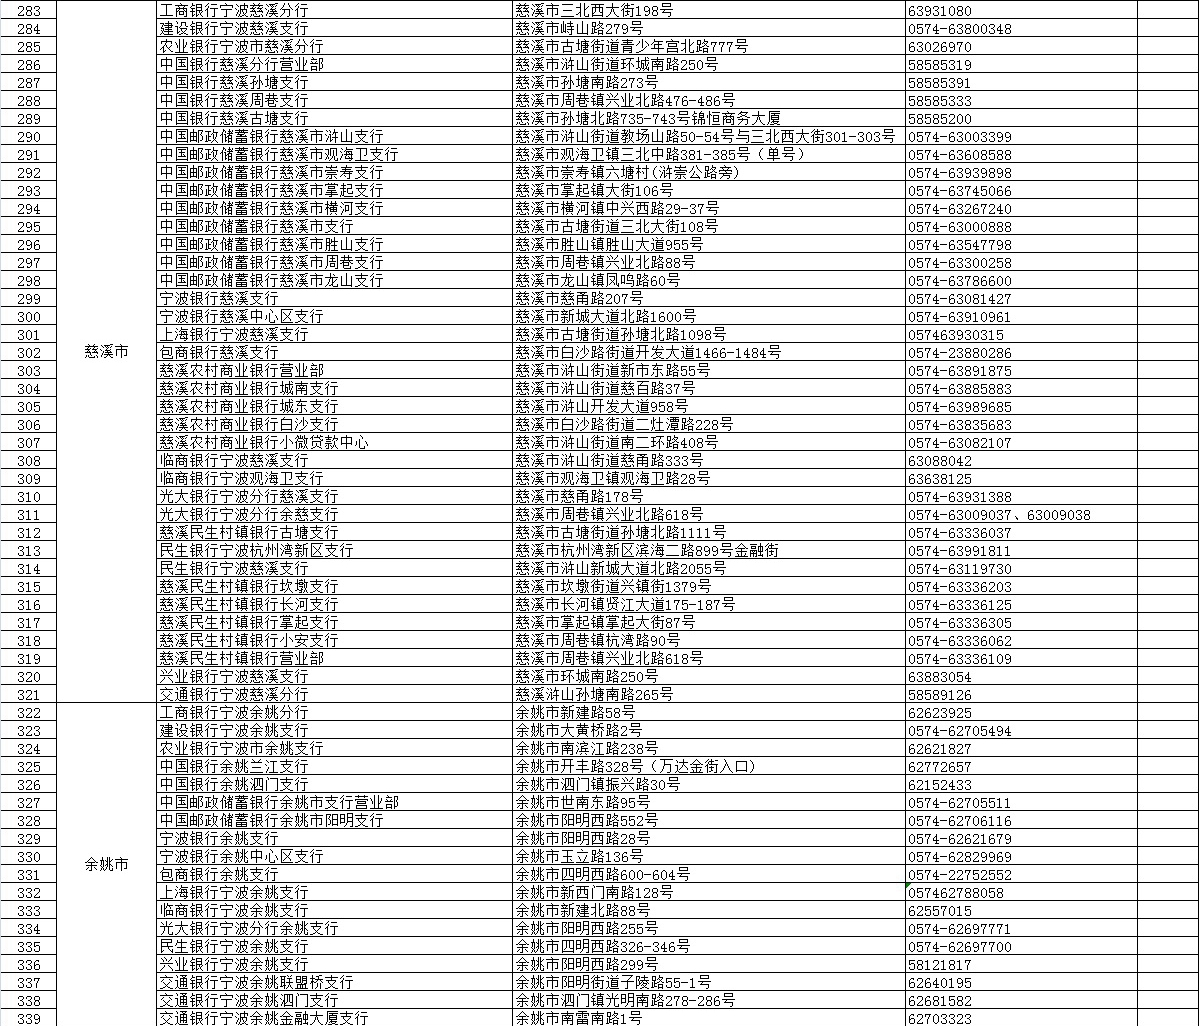 C:\Users\Administrator\Desktop\银行资金监管服务点11-27更新图片-3-2.jpg